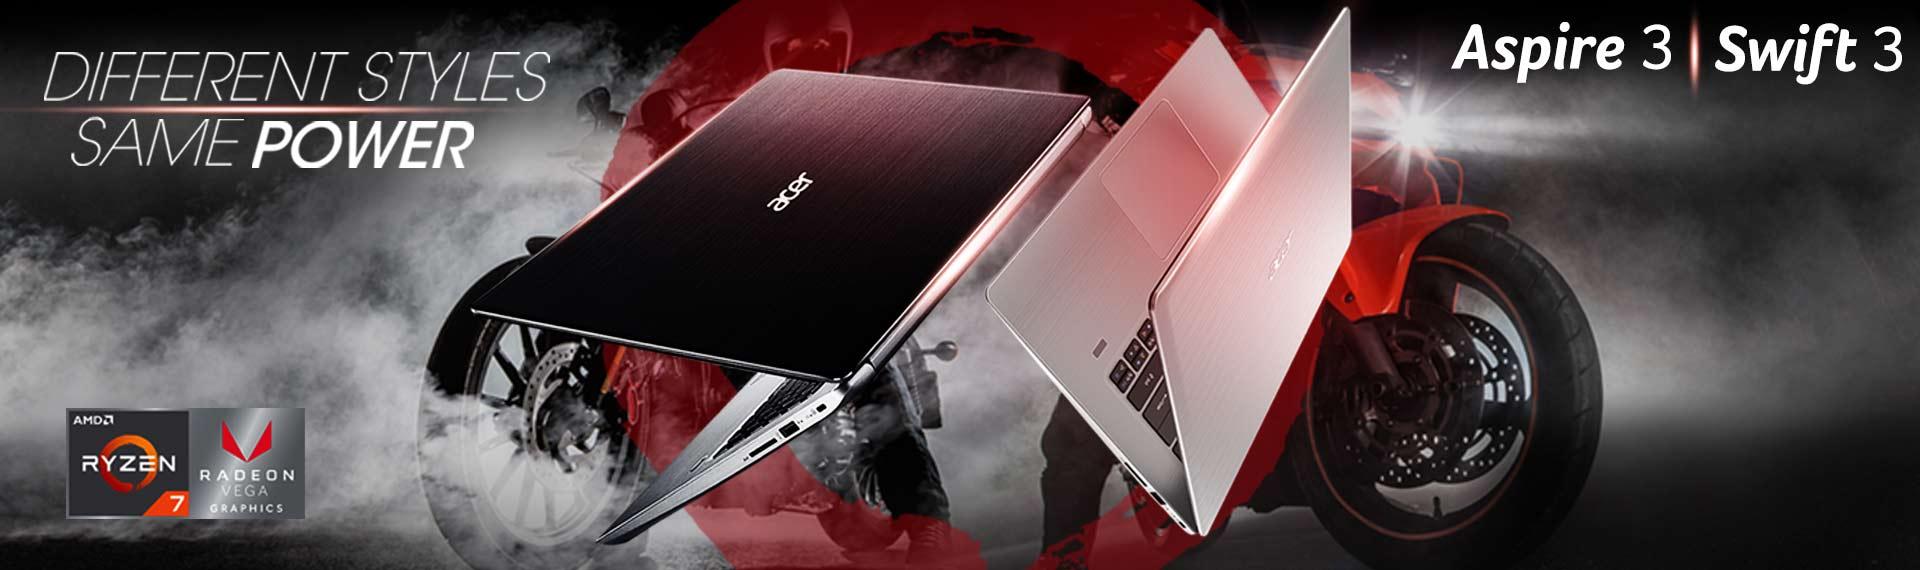 Alasan AMD Ryzen™ 3, 5, dan 7 Mampu Memaksimalkan Performa Laptopmu